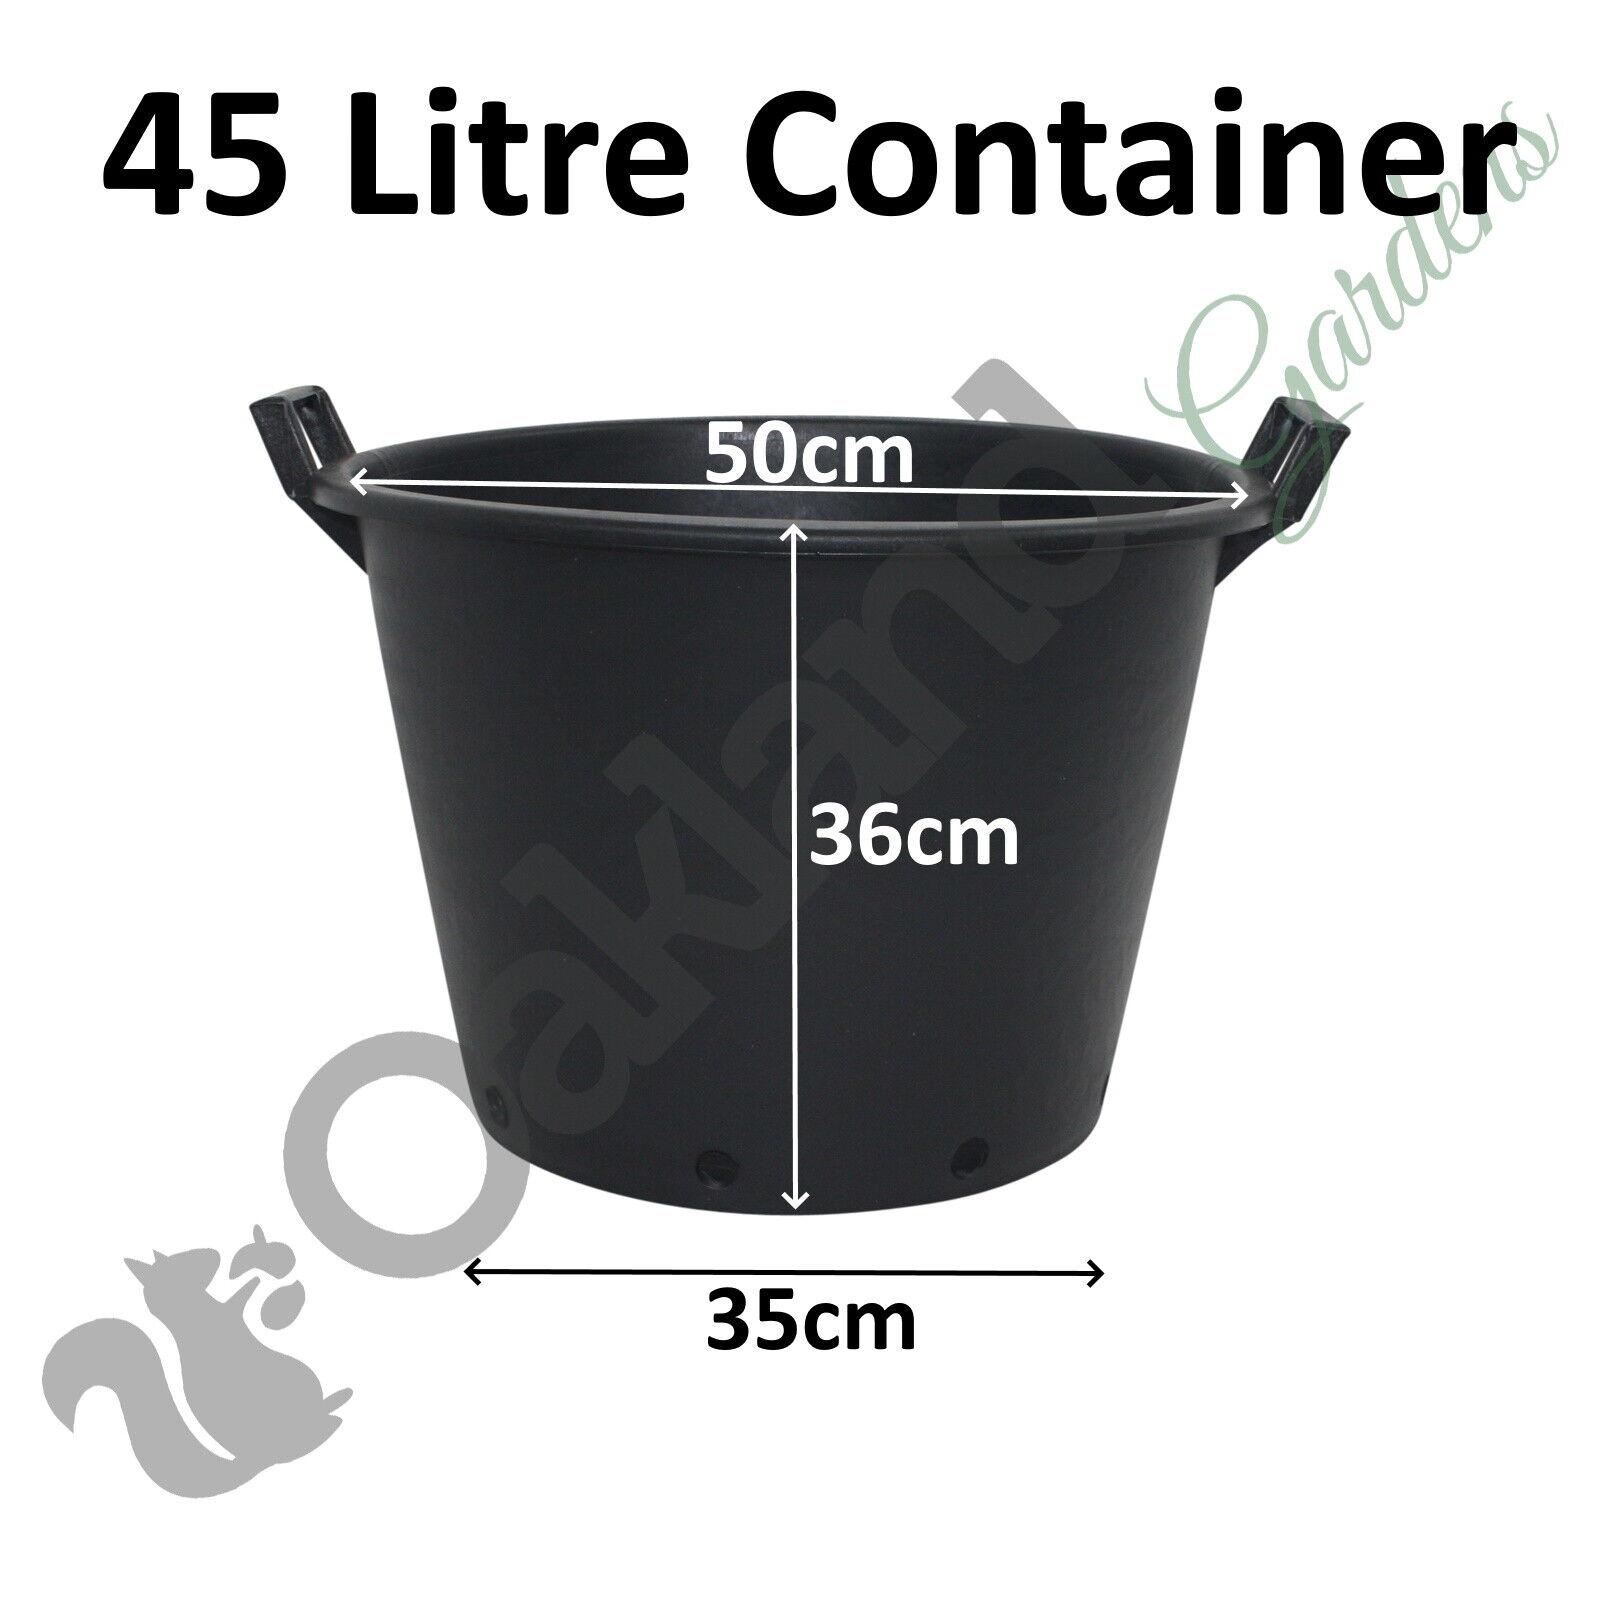 1 x 45 Litre Plant Tree Pot With Handles Heavy Duty 45L Lt Big Large Plastic